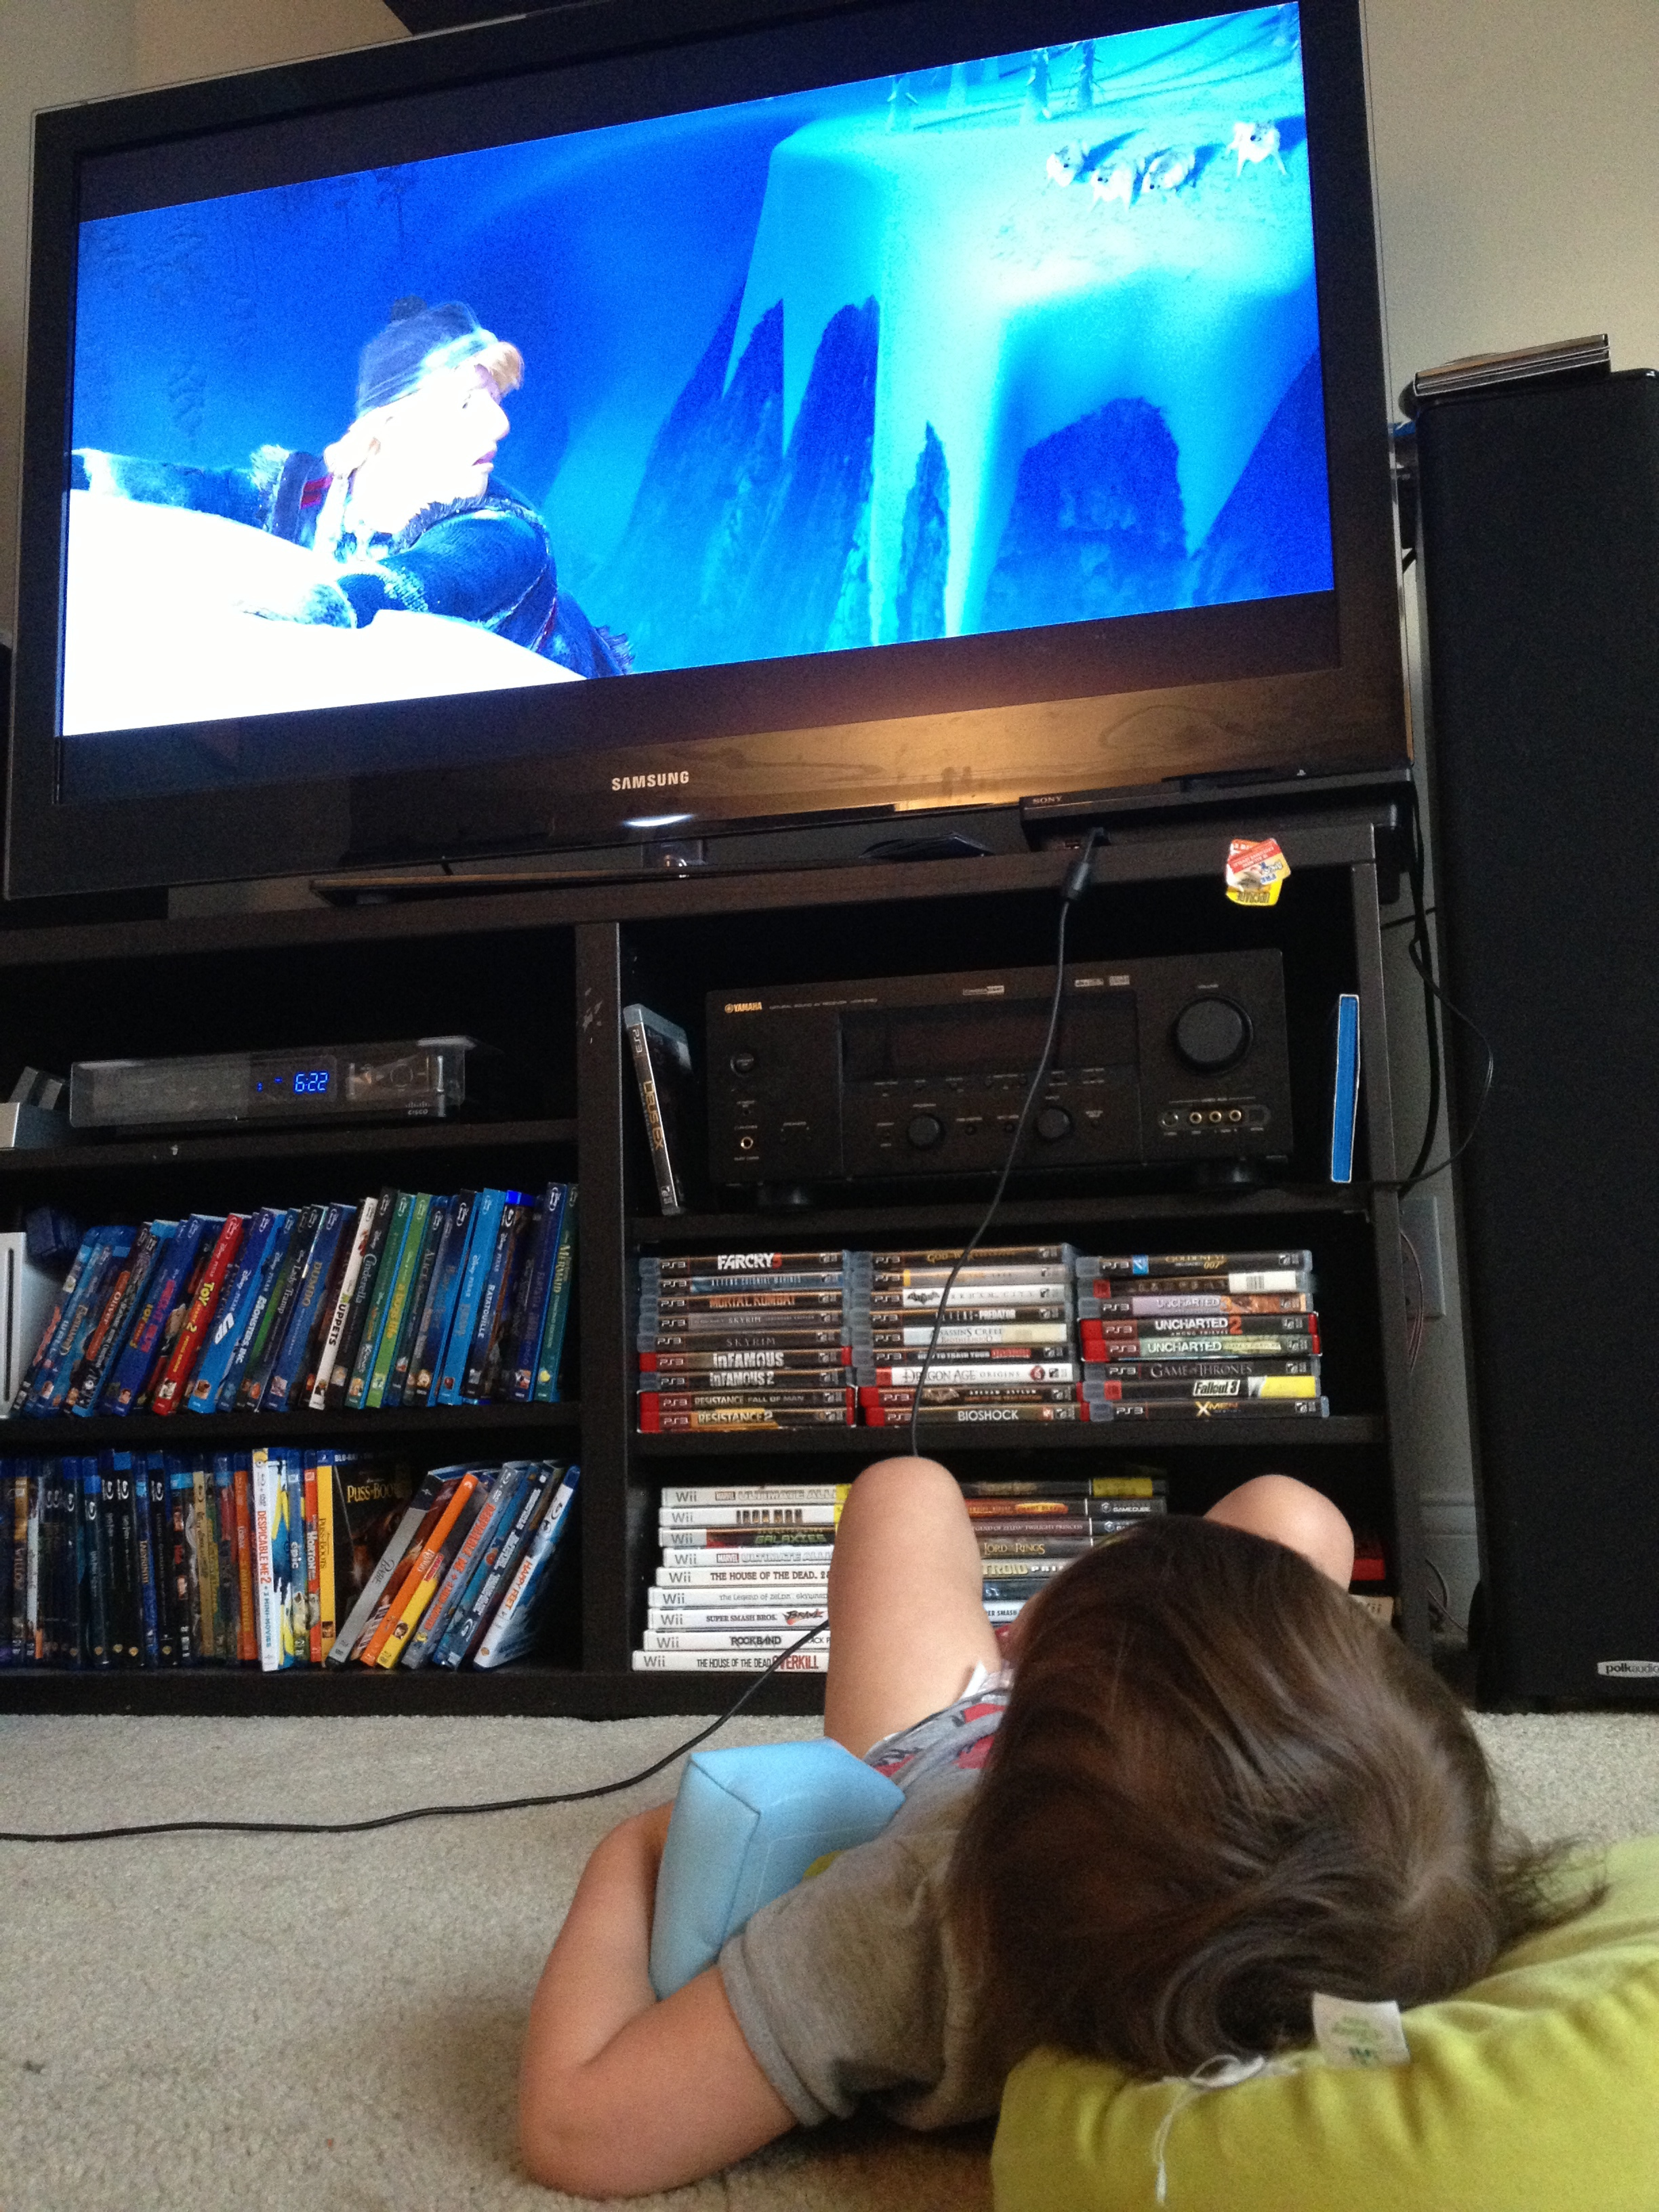 Frozen viewing #1,211,523